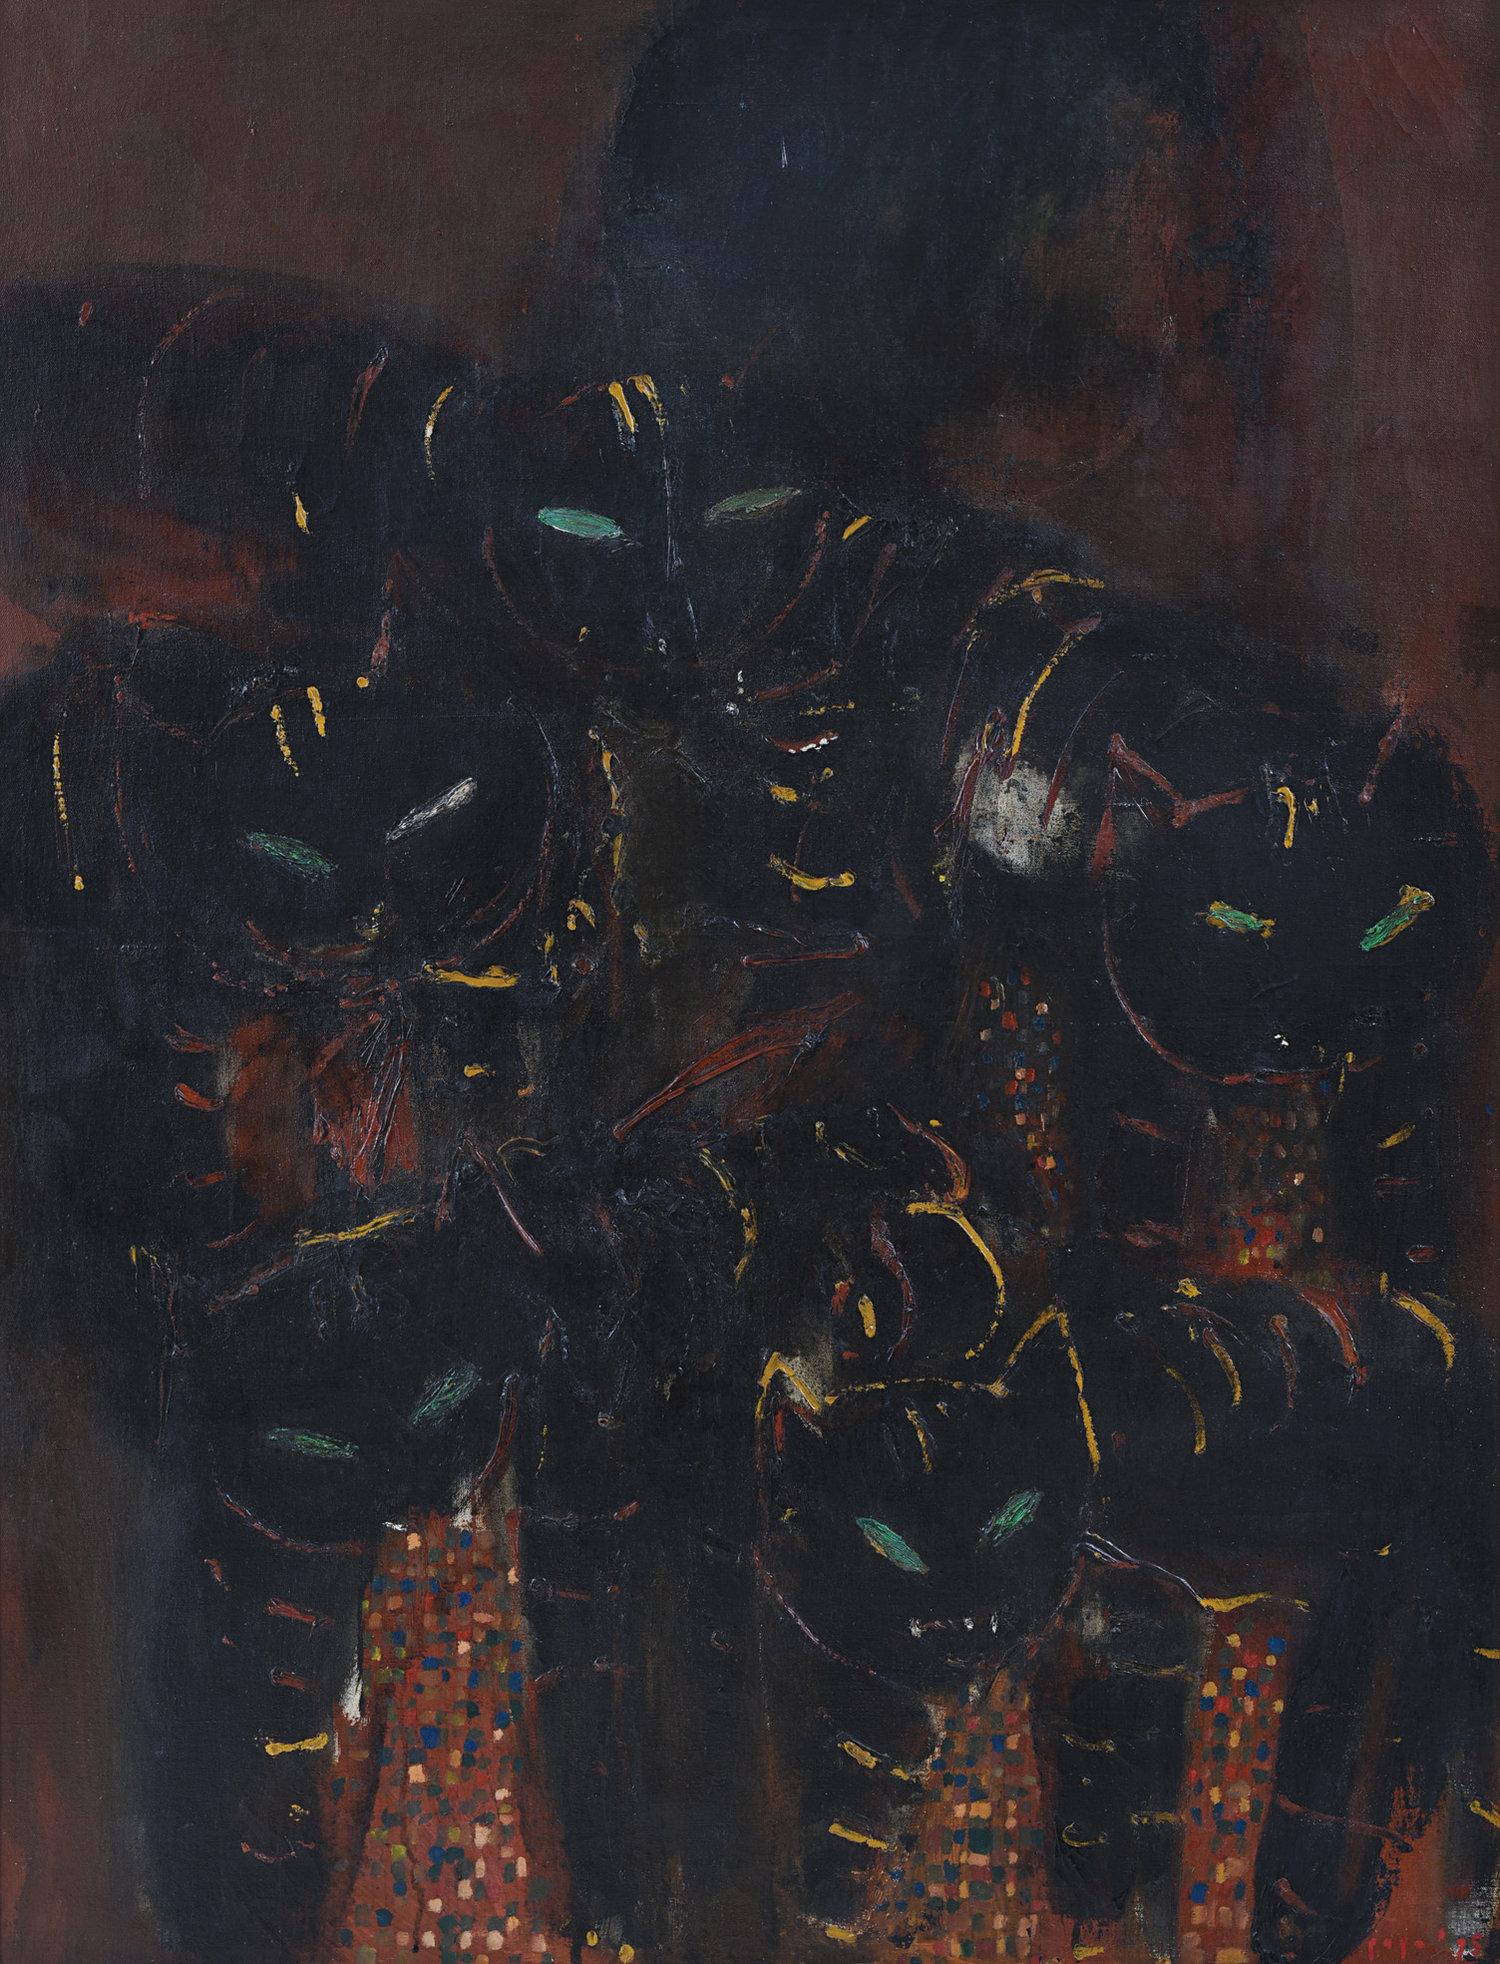 Popo Iskandar, Five Cats, oil on canvas, 124 x 94 cm, 1995